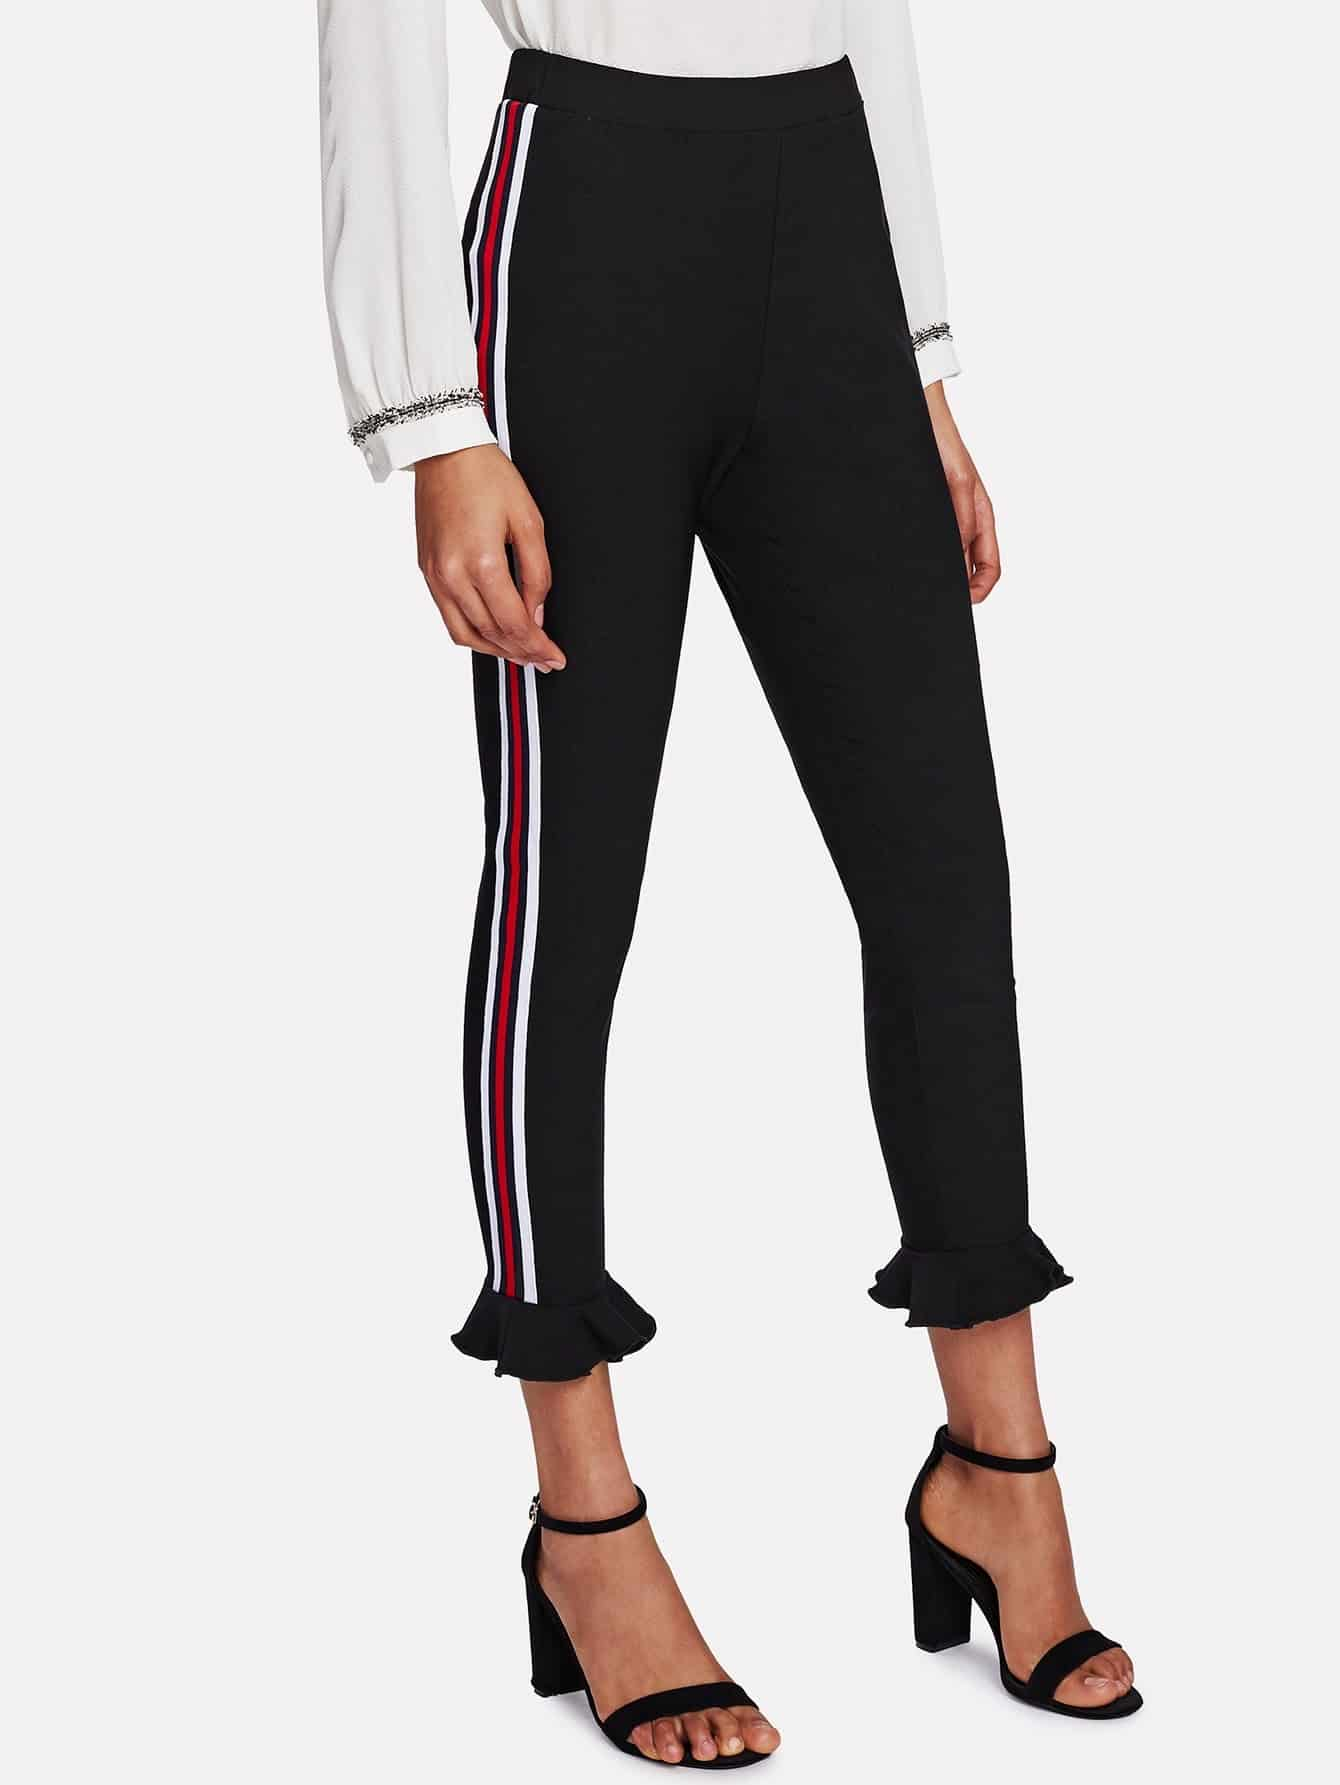 Shoppr Fashion Beauty Search Shopping For Women Azure Star Pants Legging Celana Panjang